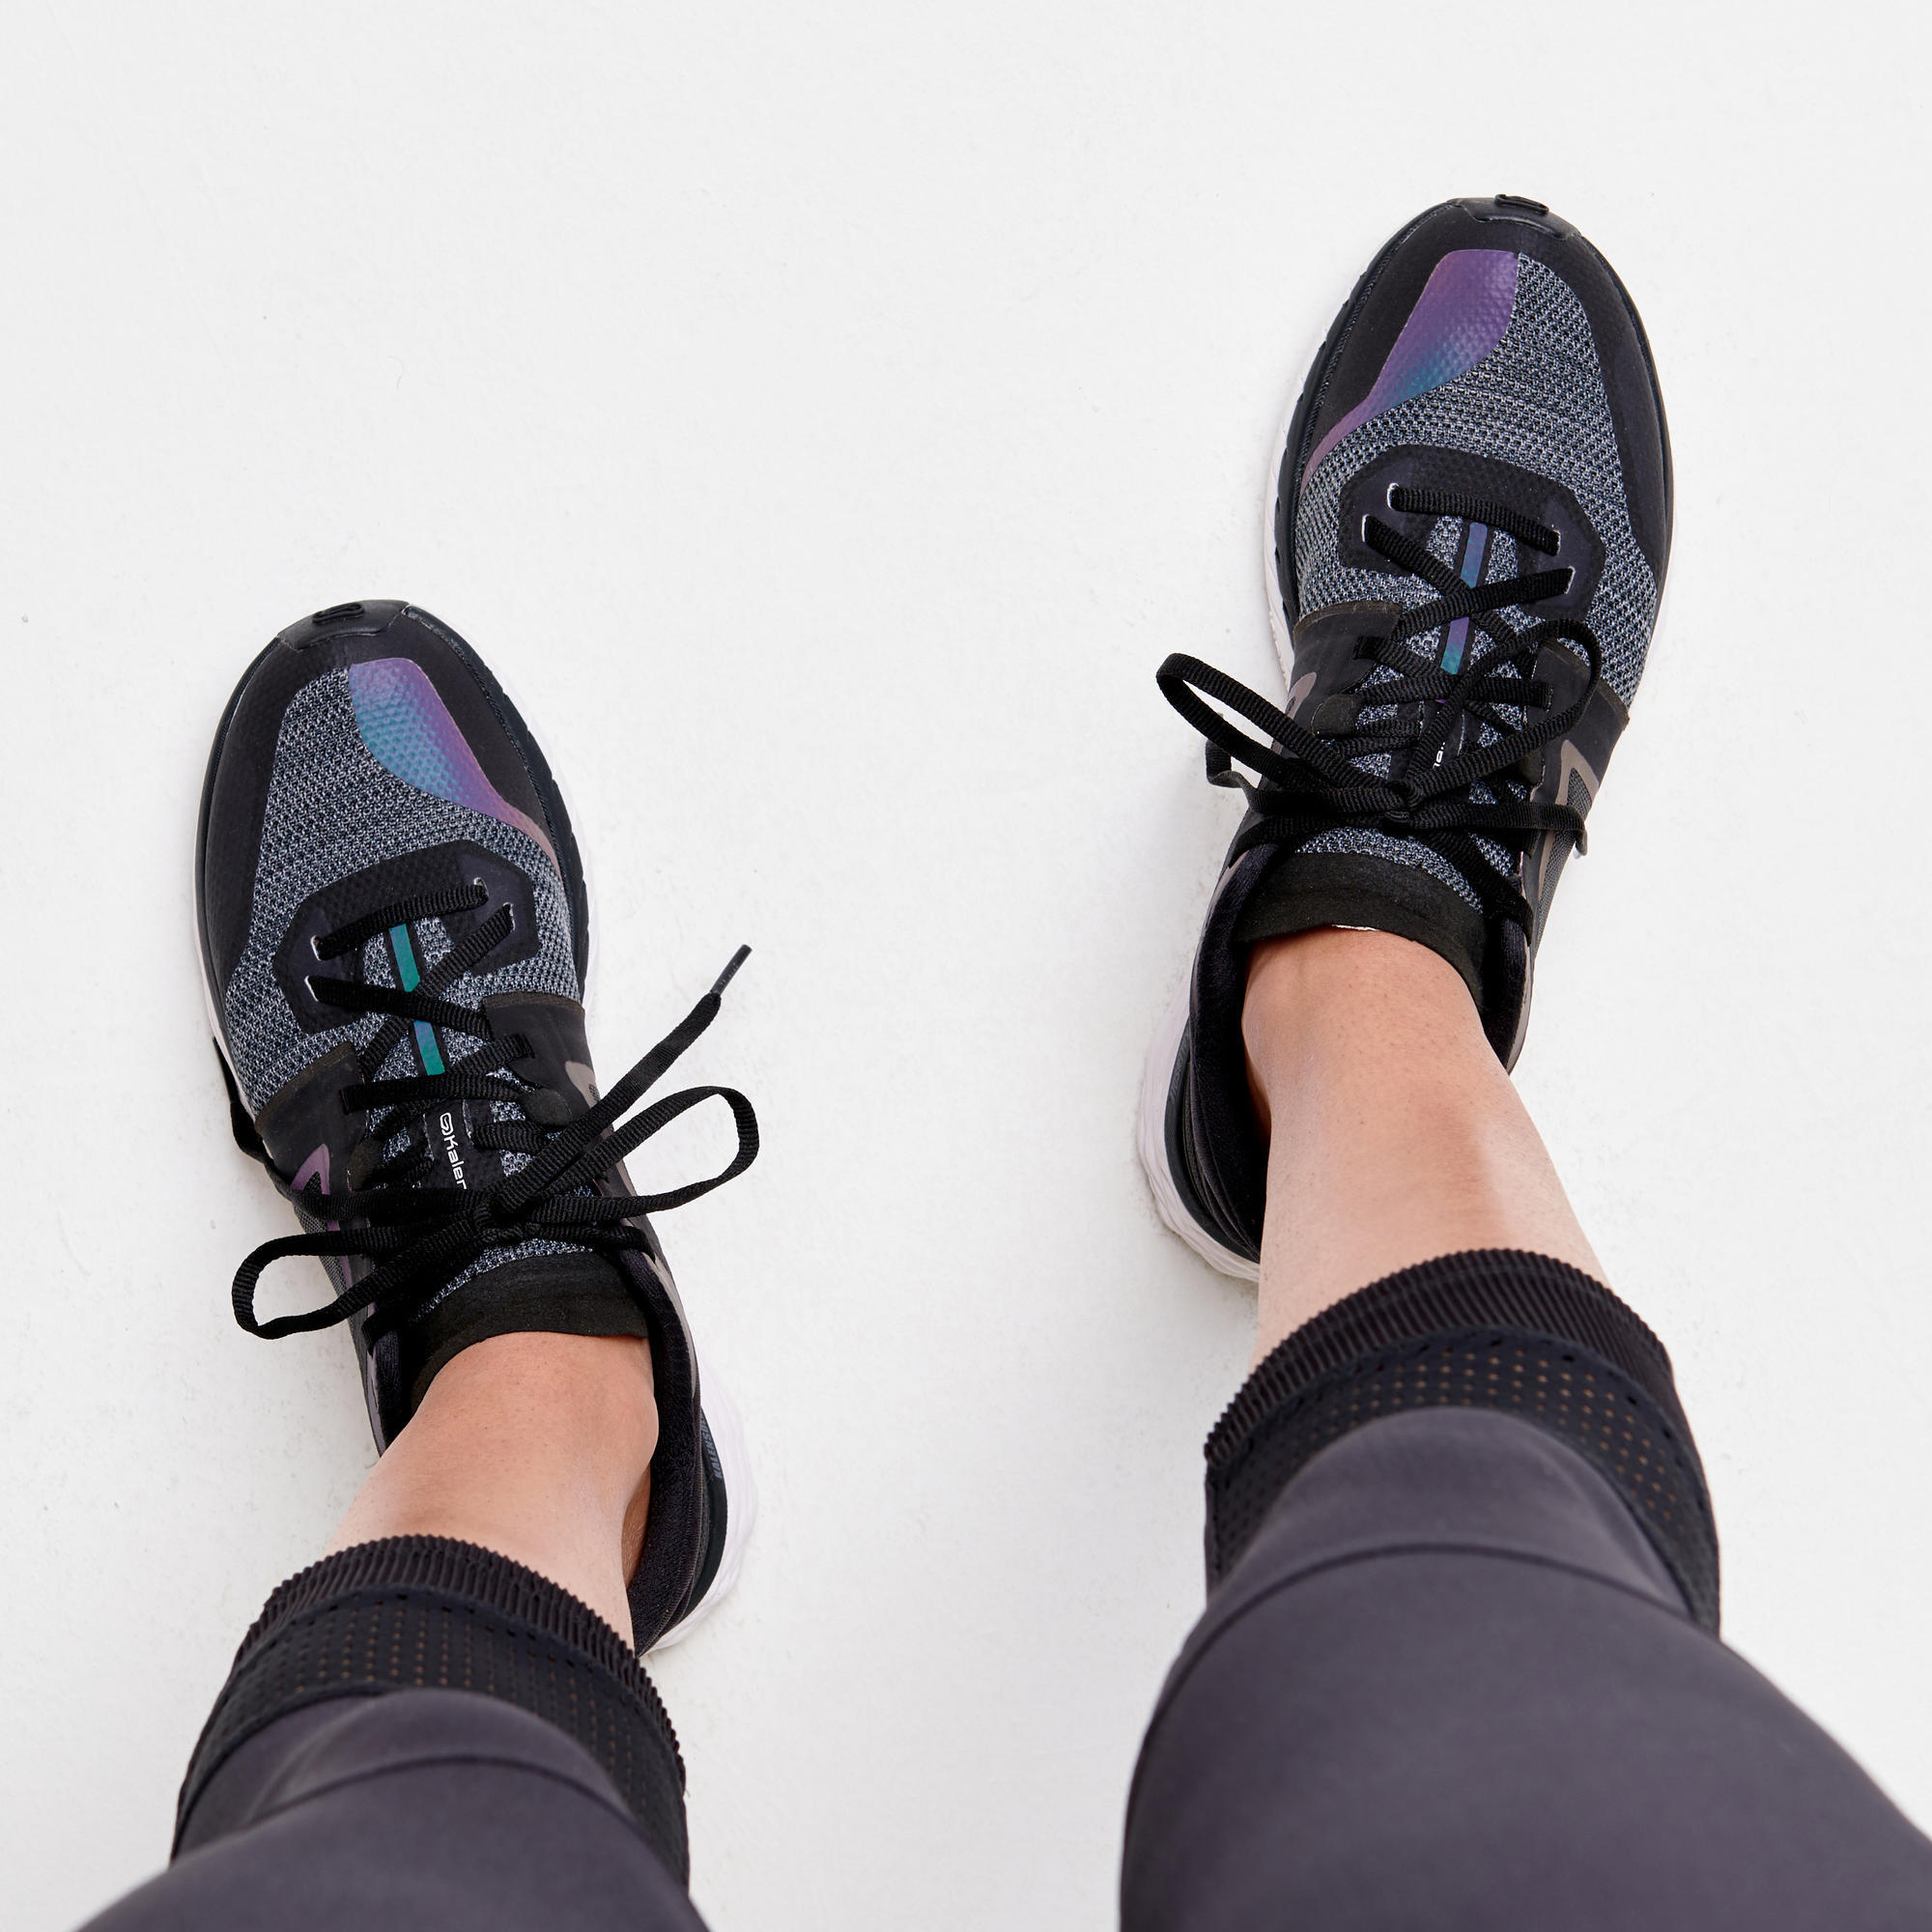 Women's Run Comfort Shoes - Decathlon